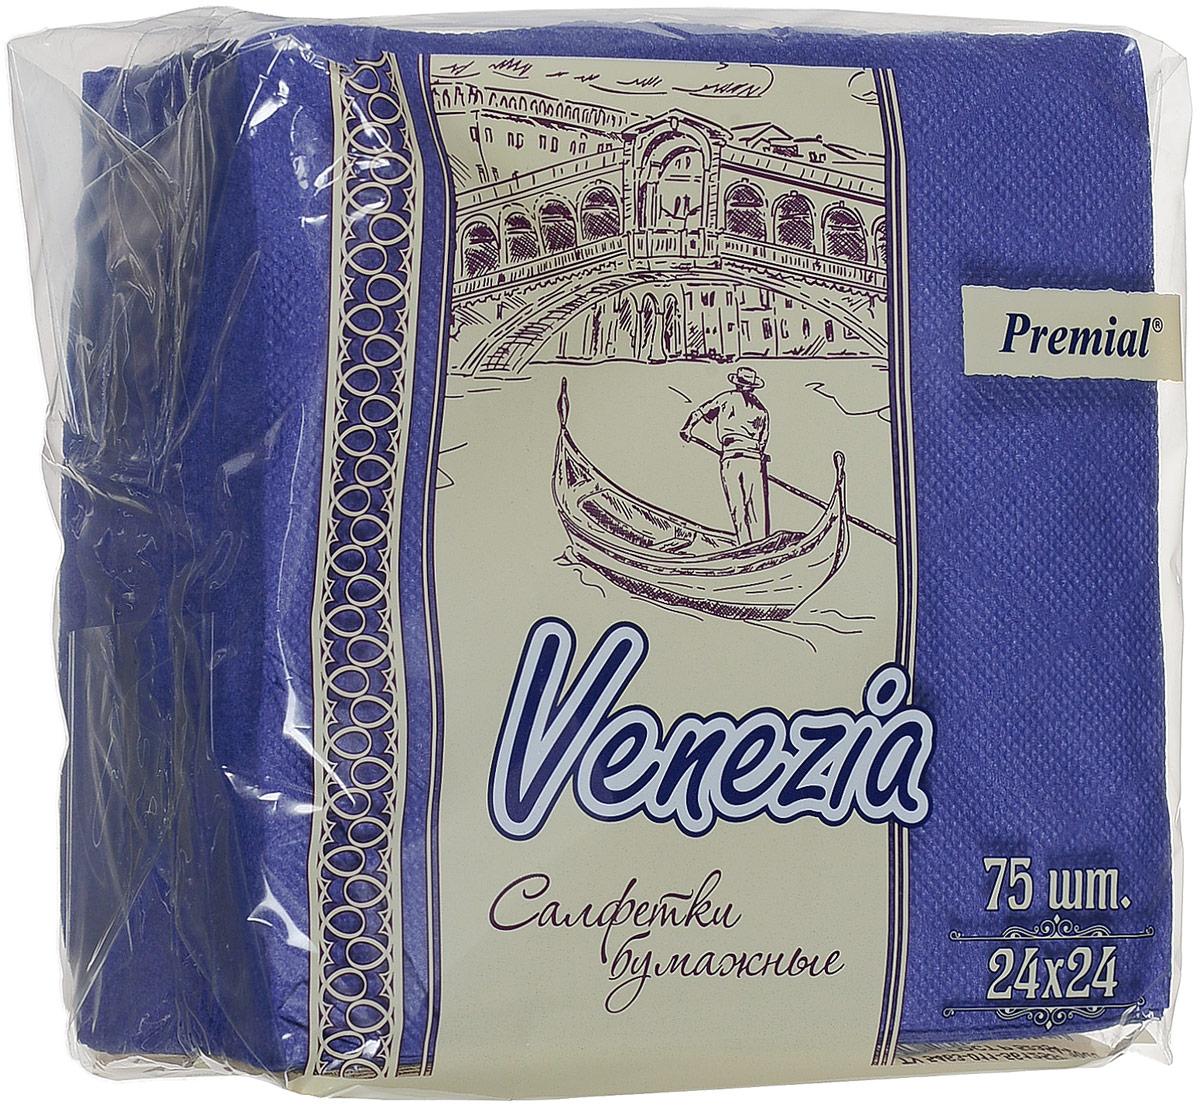 Premial Venezia Салфетки декоративные однослойные цветные, 75 шт цвет: синий0910-2138_синийPremial Venezia Салфетки декоративные однослойные цветные, 75 шт цвет: синий